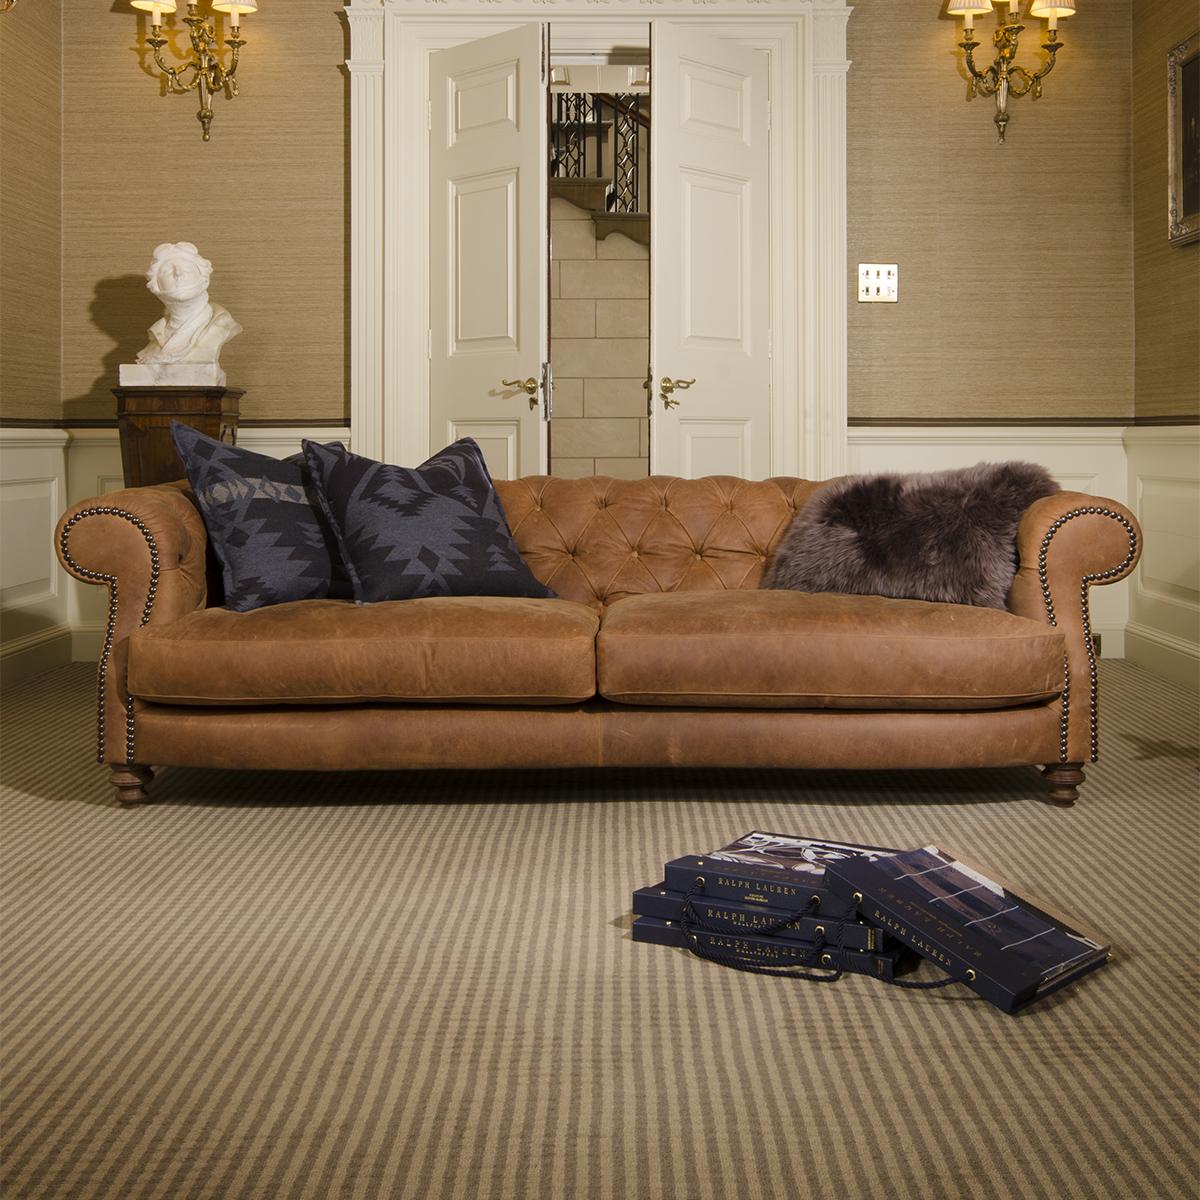 Ralph Lauren Living Room Furniture Tetrad Upholstery Grand Madison Chesterfield In Ralph Lauren